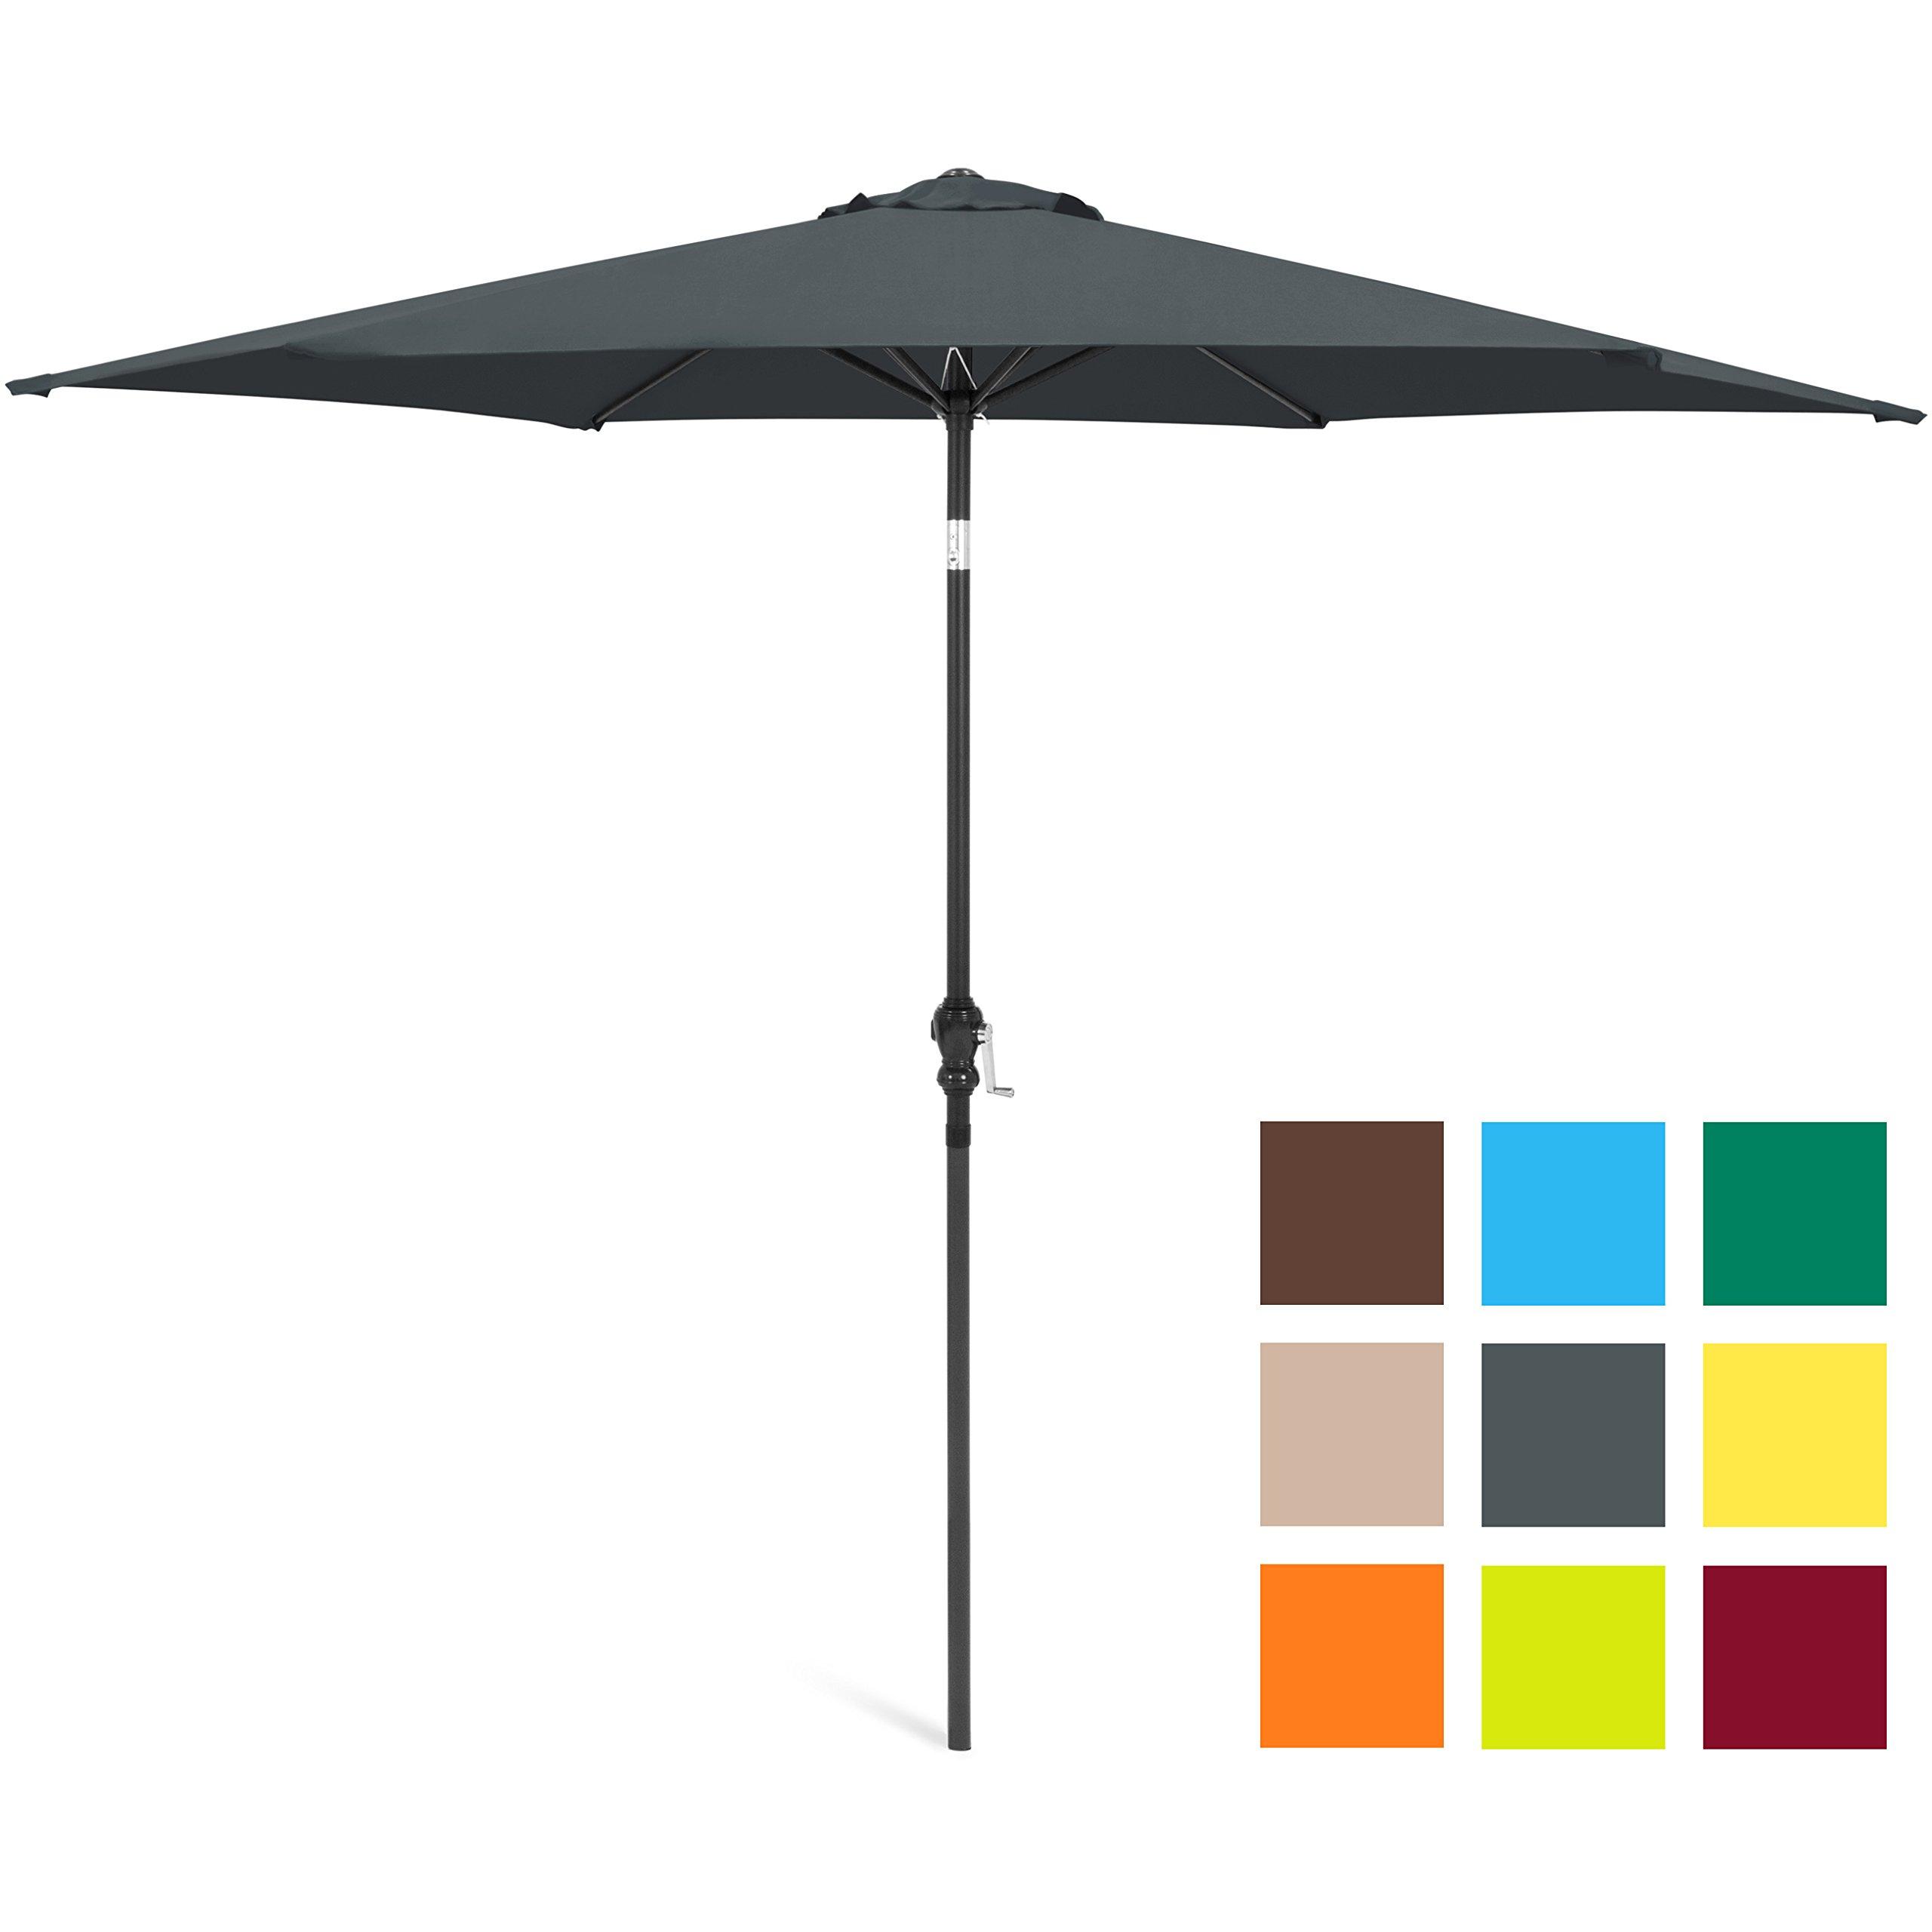 Best Choice Products 10ft Steel Market Outdoor Patio Umbrella w/Crank, Tilt Push Button - Gray